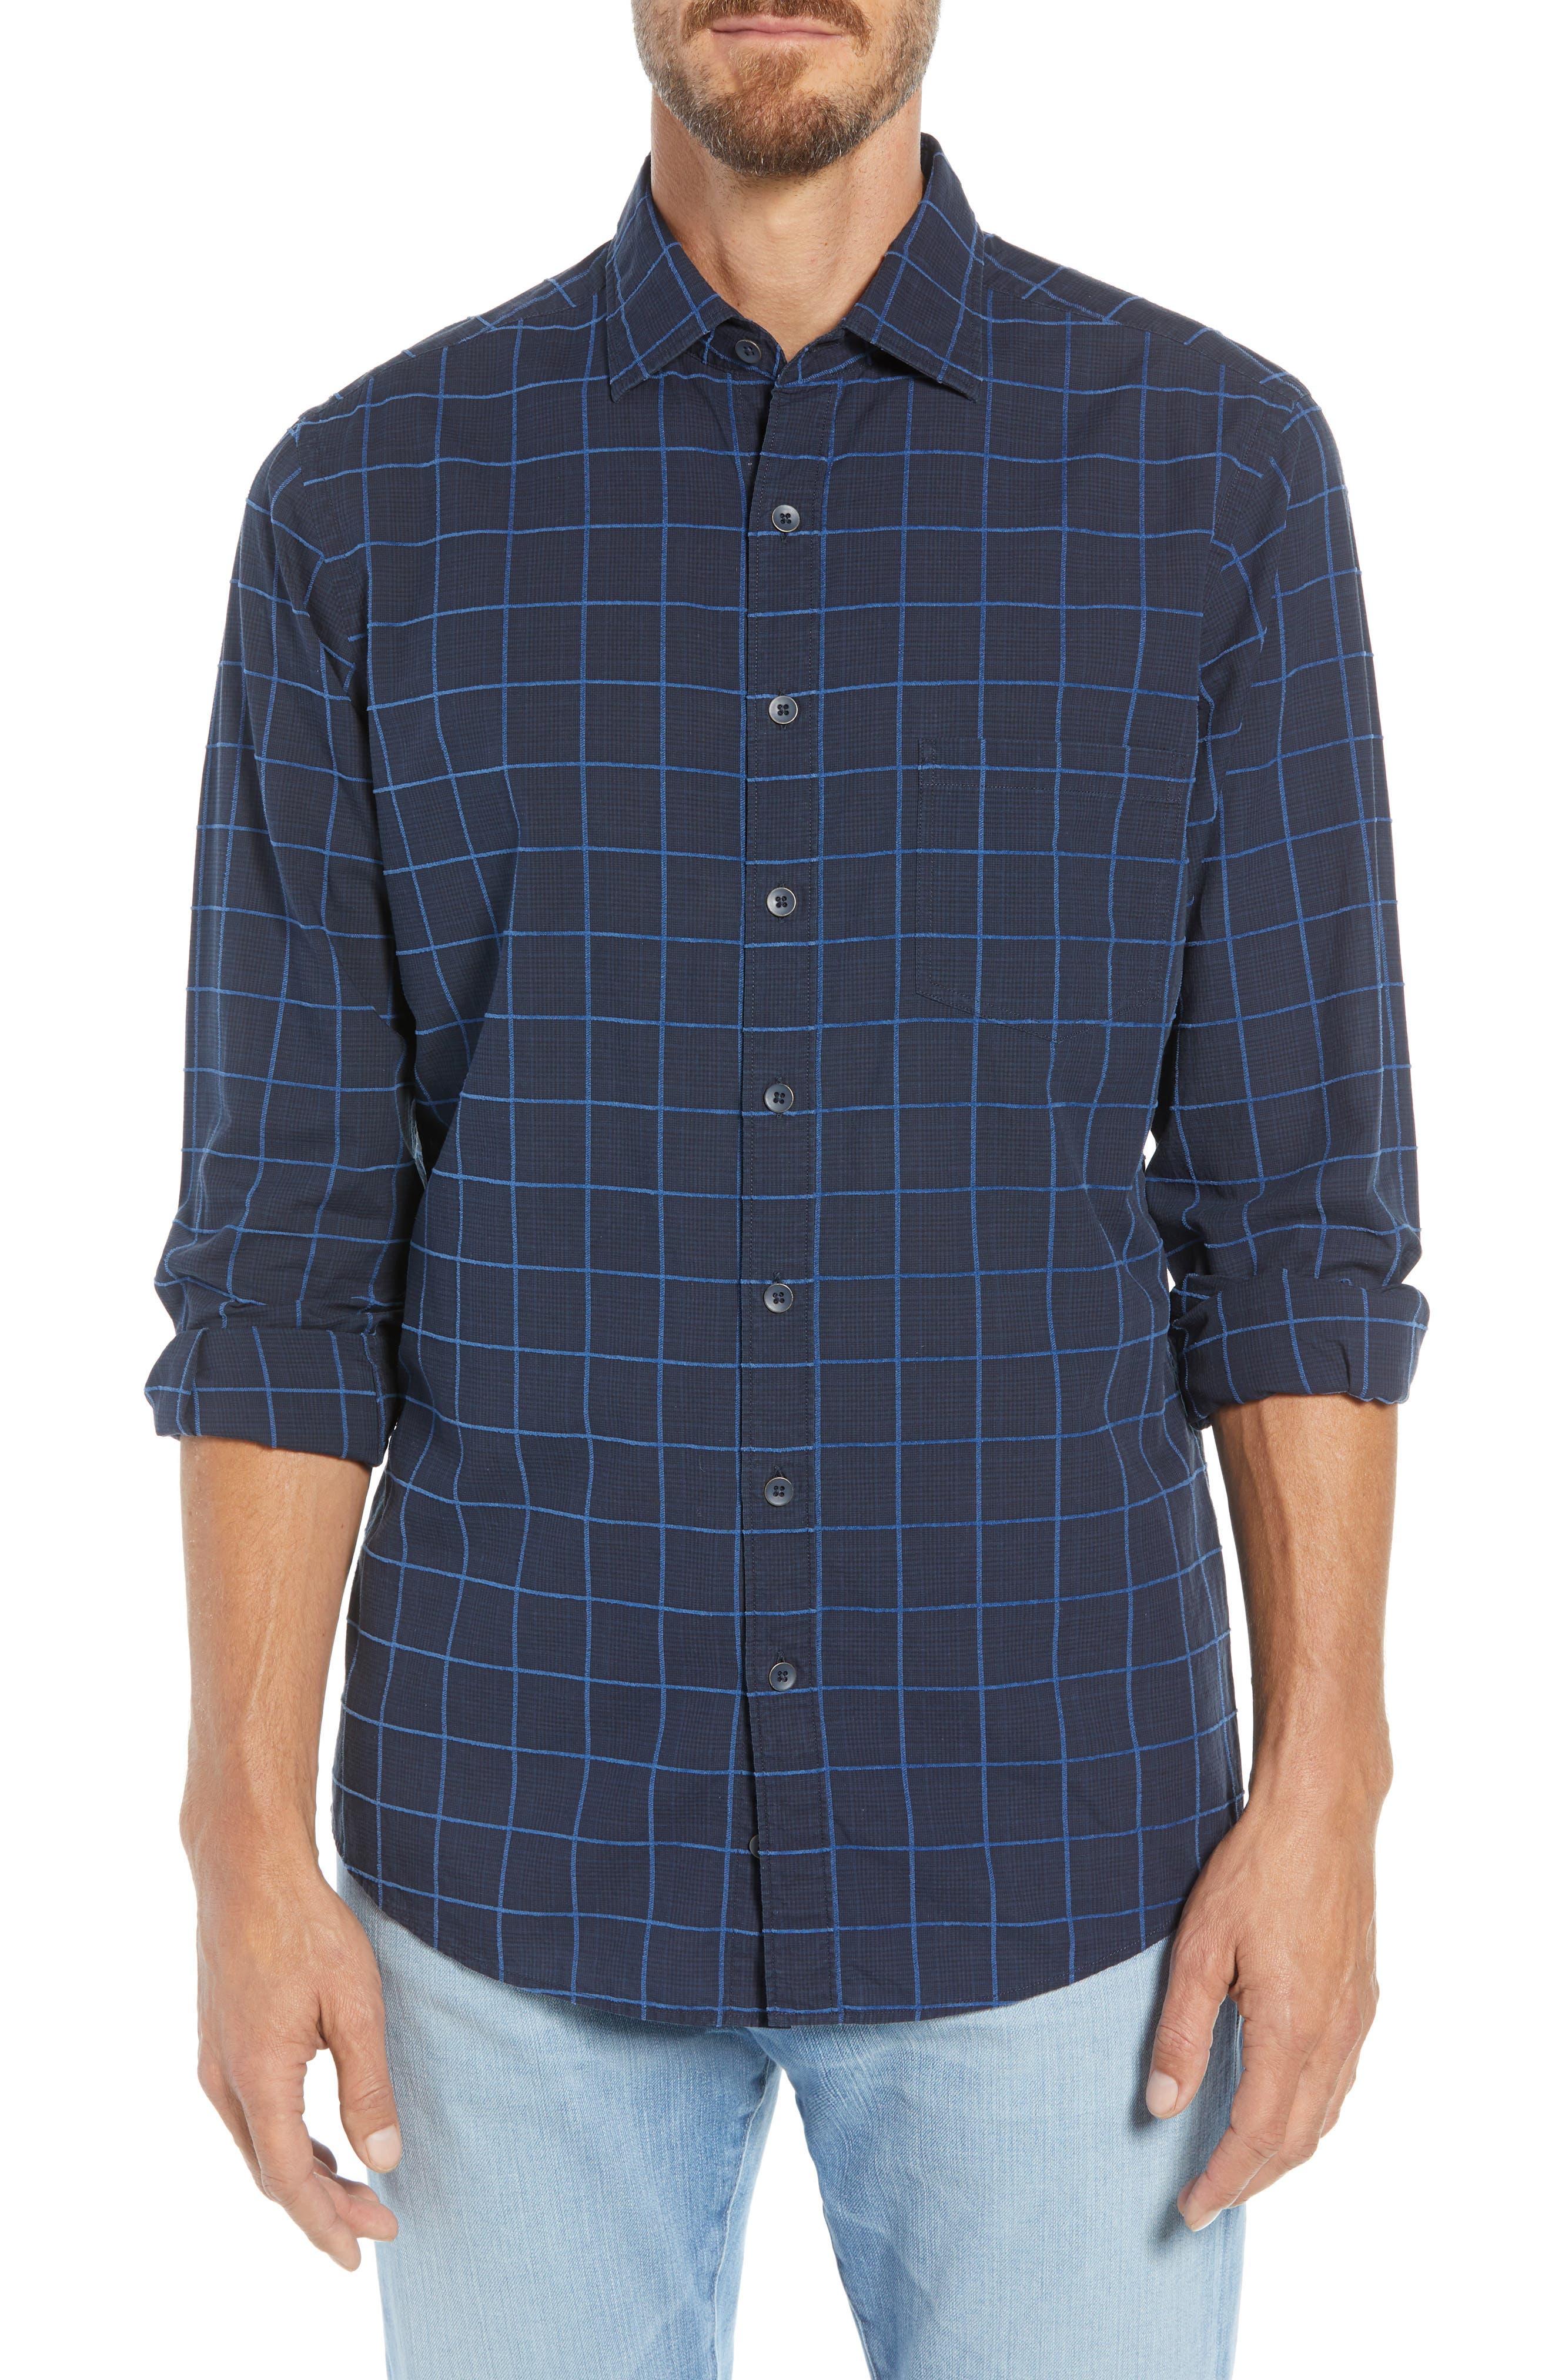 RODD & GUNN, Hindley Creek Regular Fit Sport Shirt, Main thumbnail 1, color, NAVY